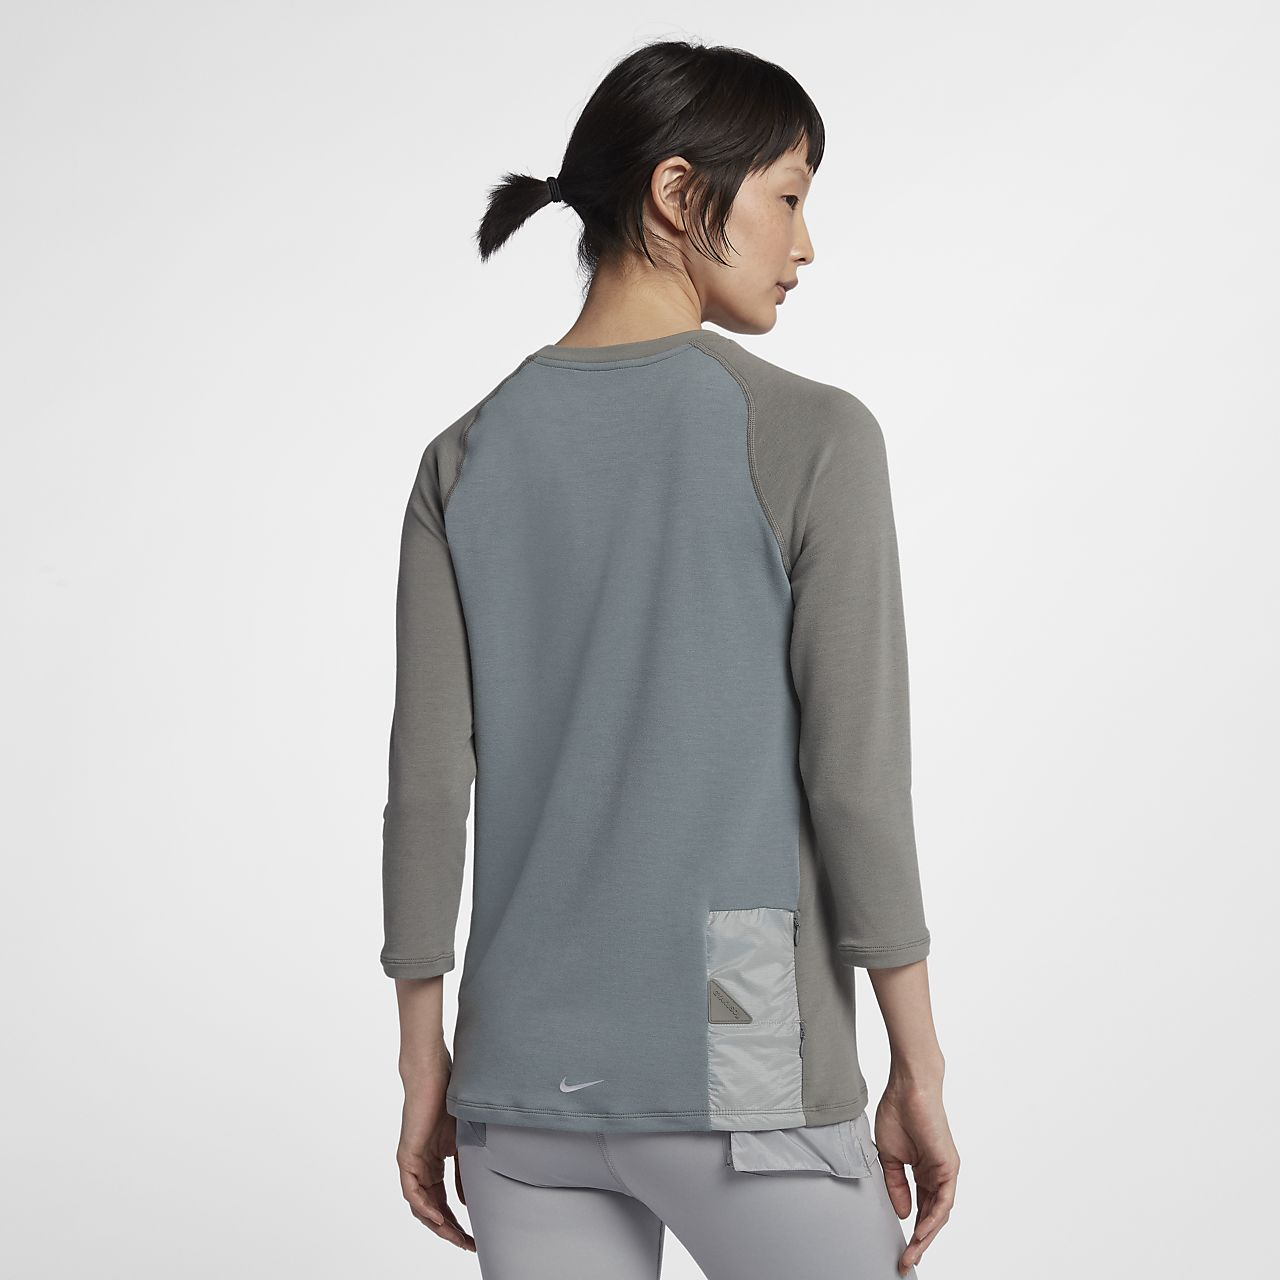 Nike Gyakusou Women's Long-Sleeve Top